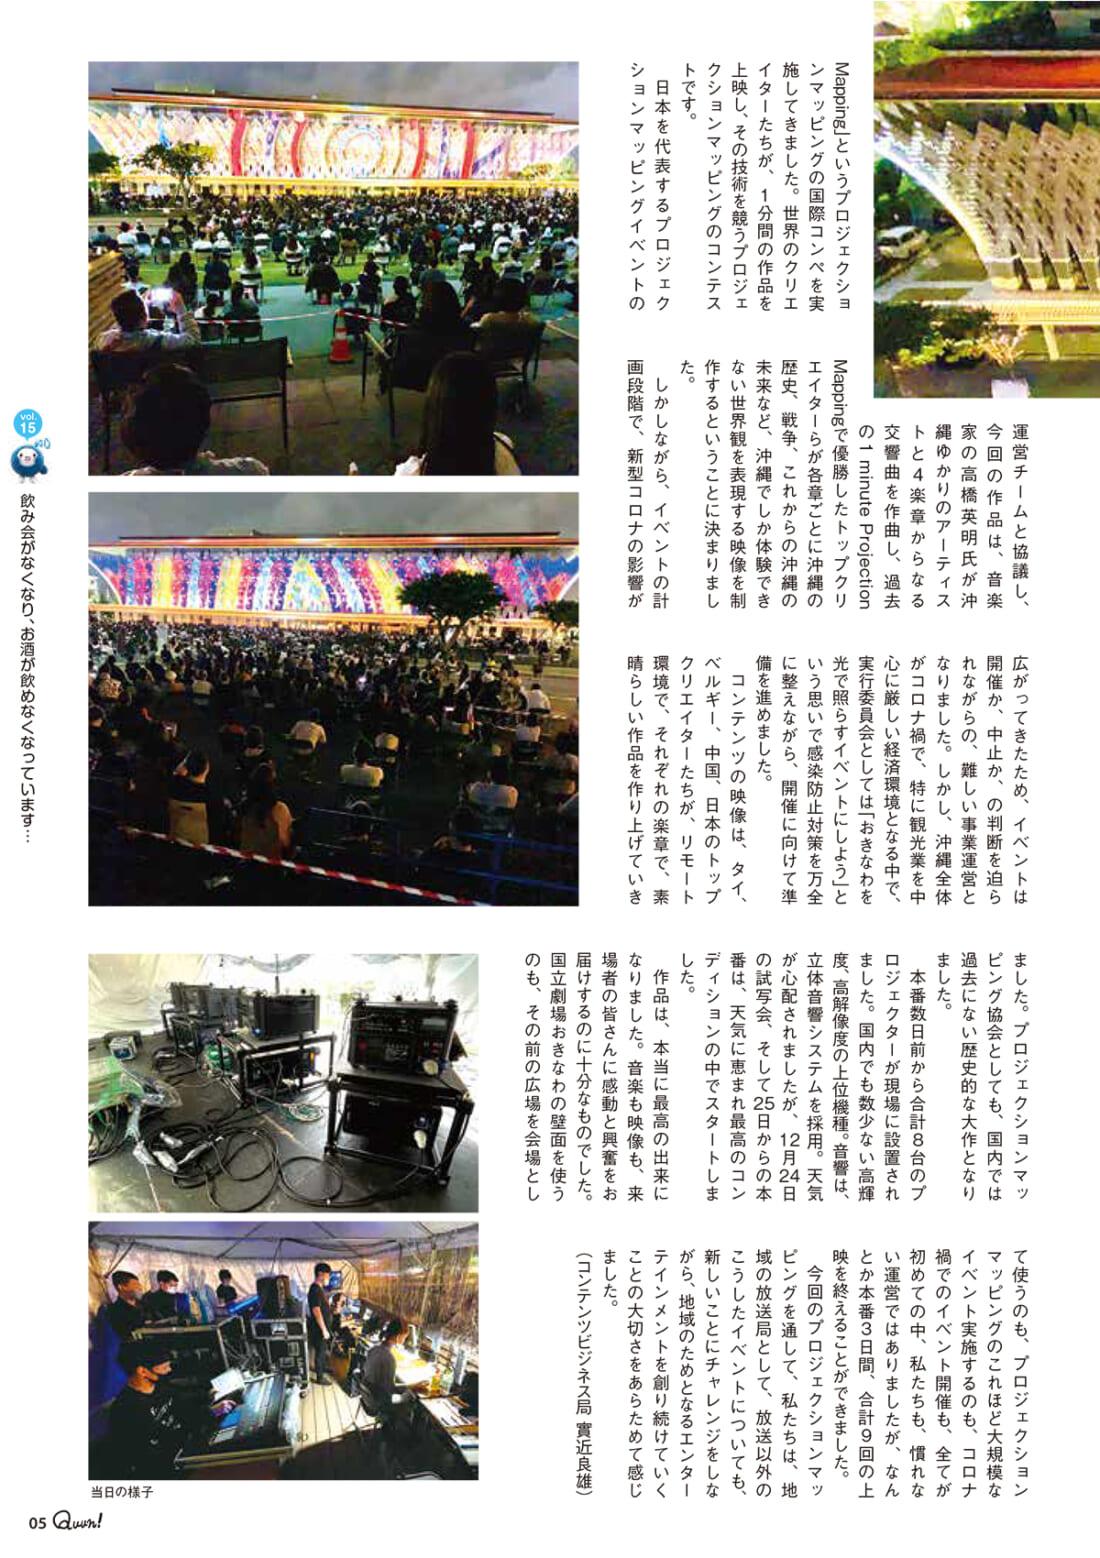 https://www.qab.co.jp/qgoro/wp-content/uploads/quun_1507-1100x1558.jpg